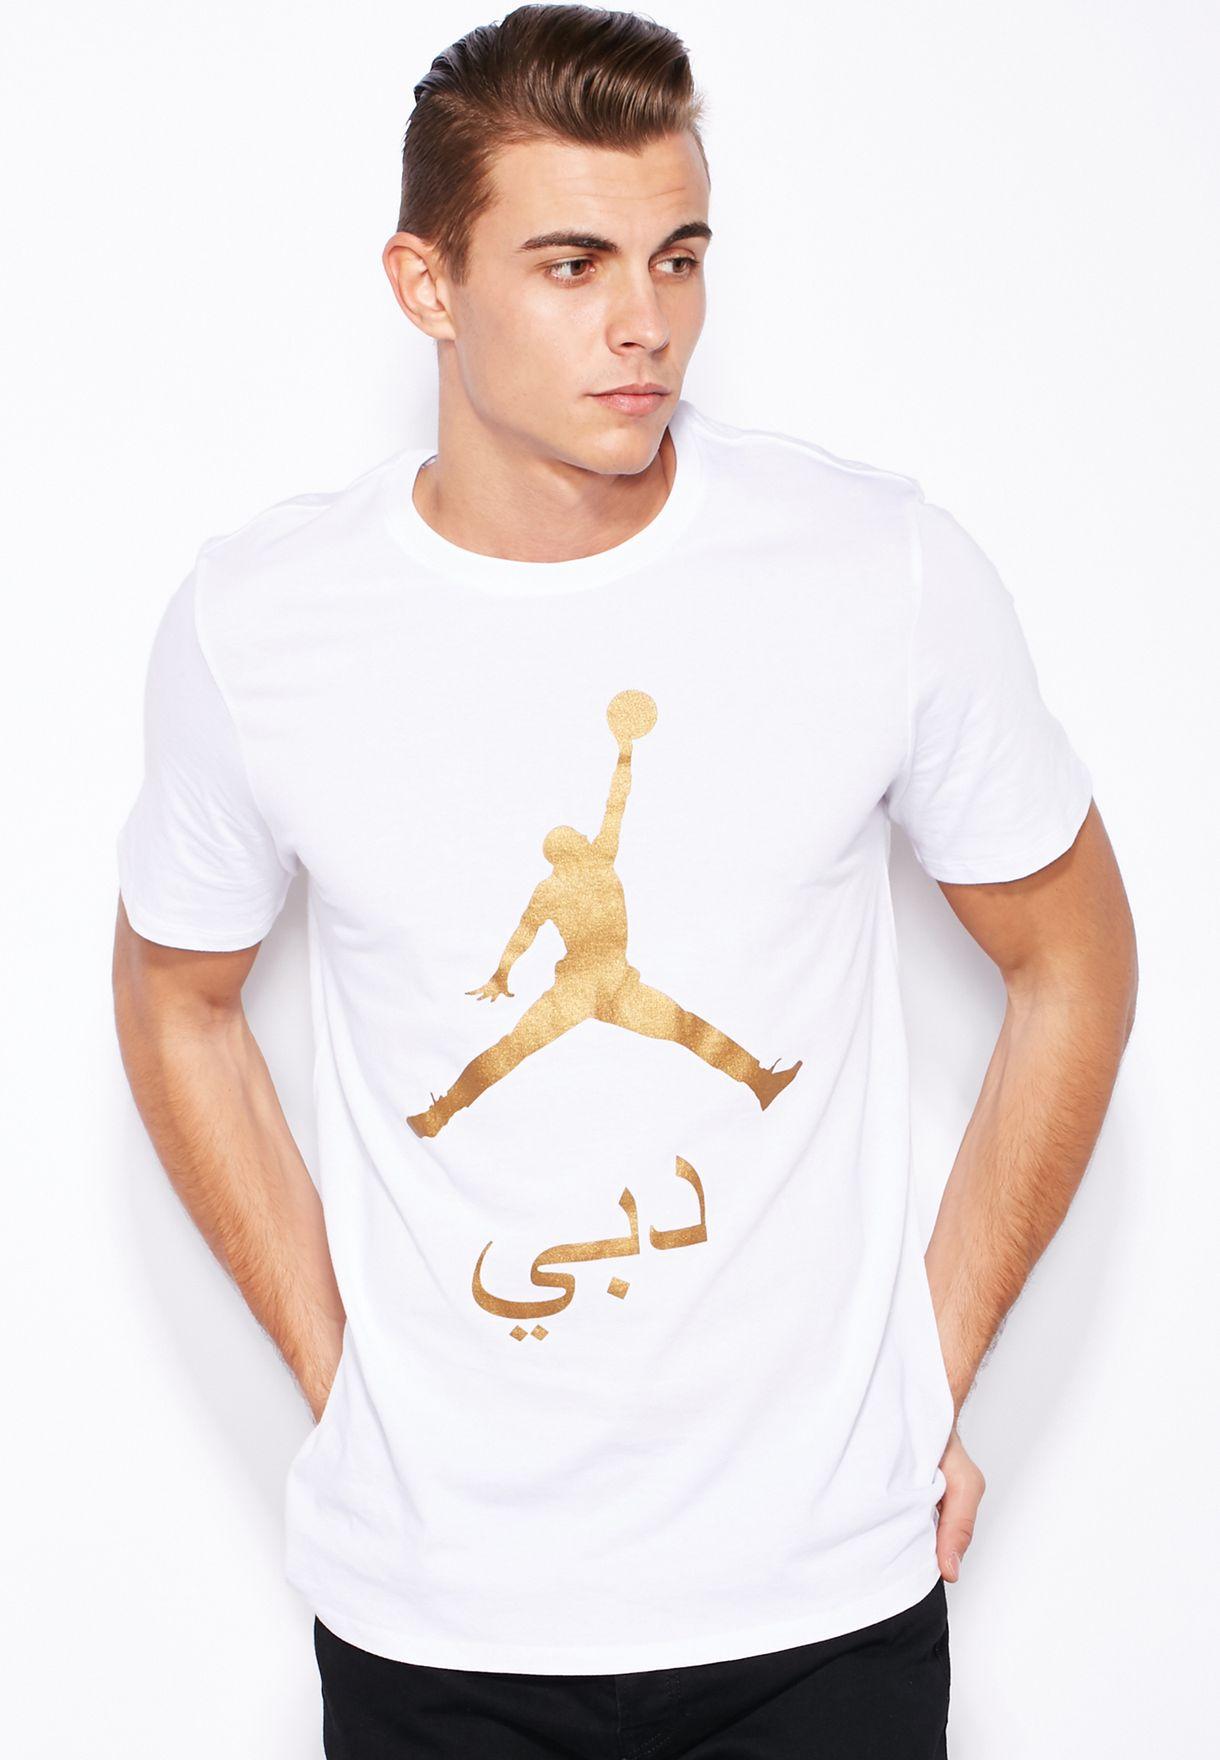 timeless design a056c 2d9ec Jordan Dubai City T-Shirt